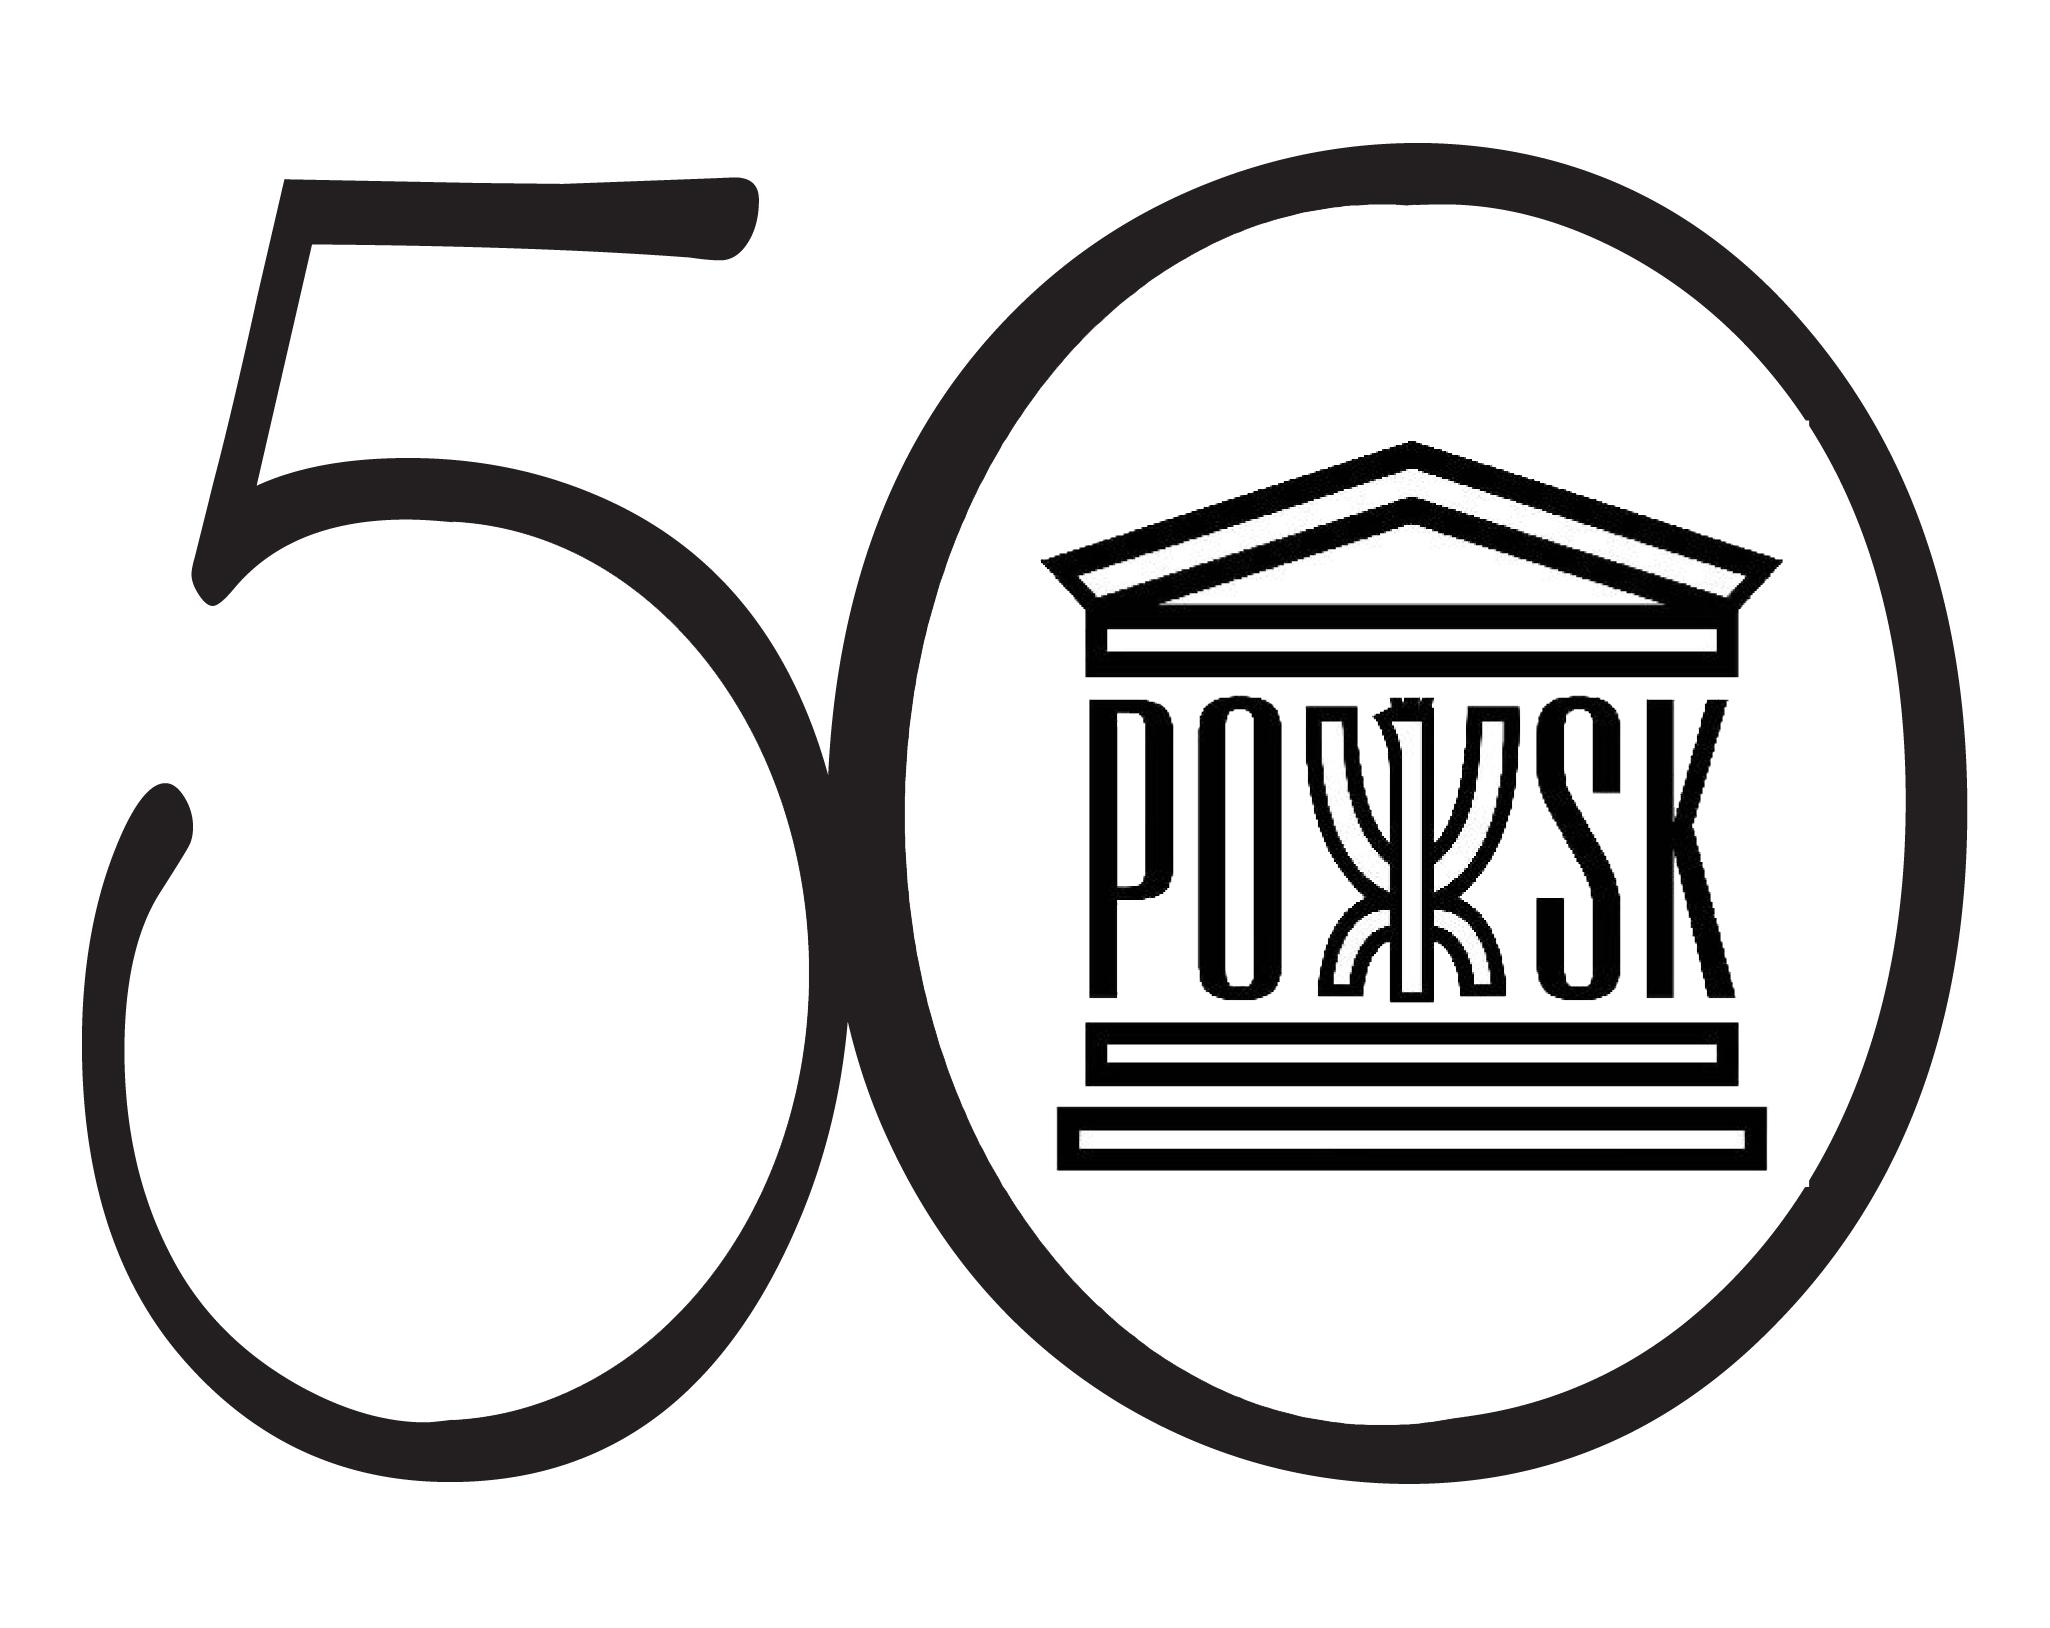 50 Years Posk